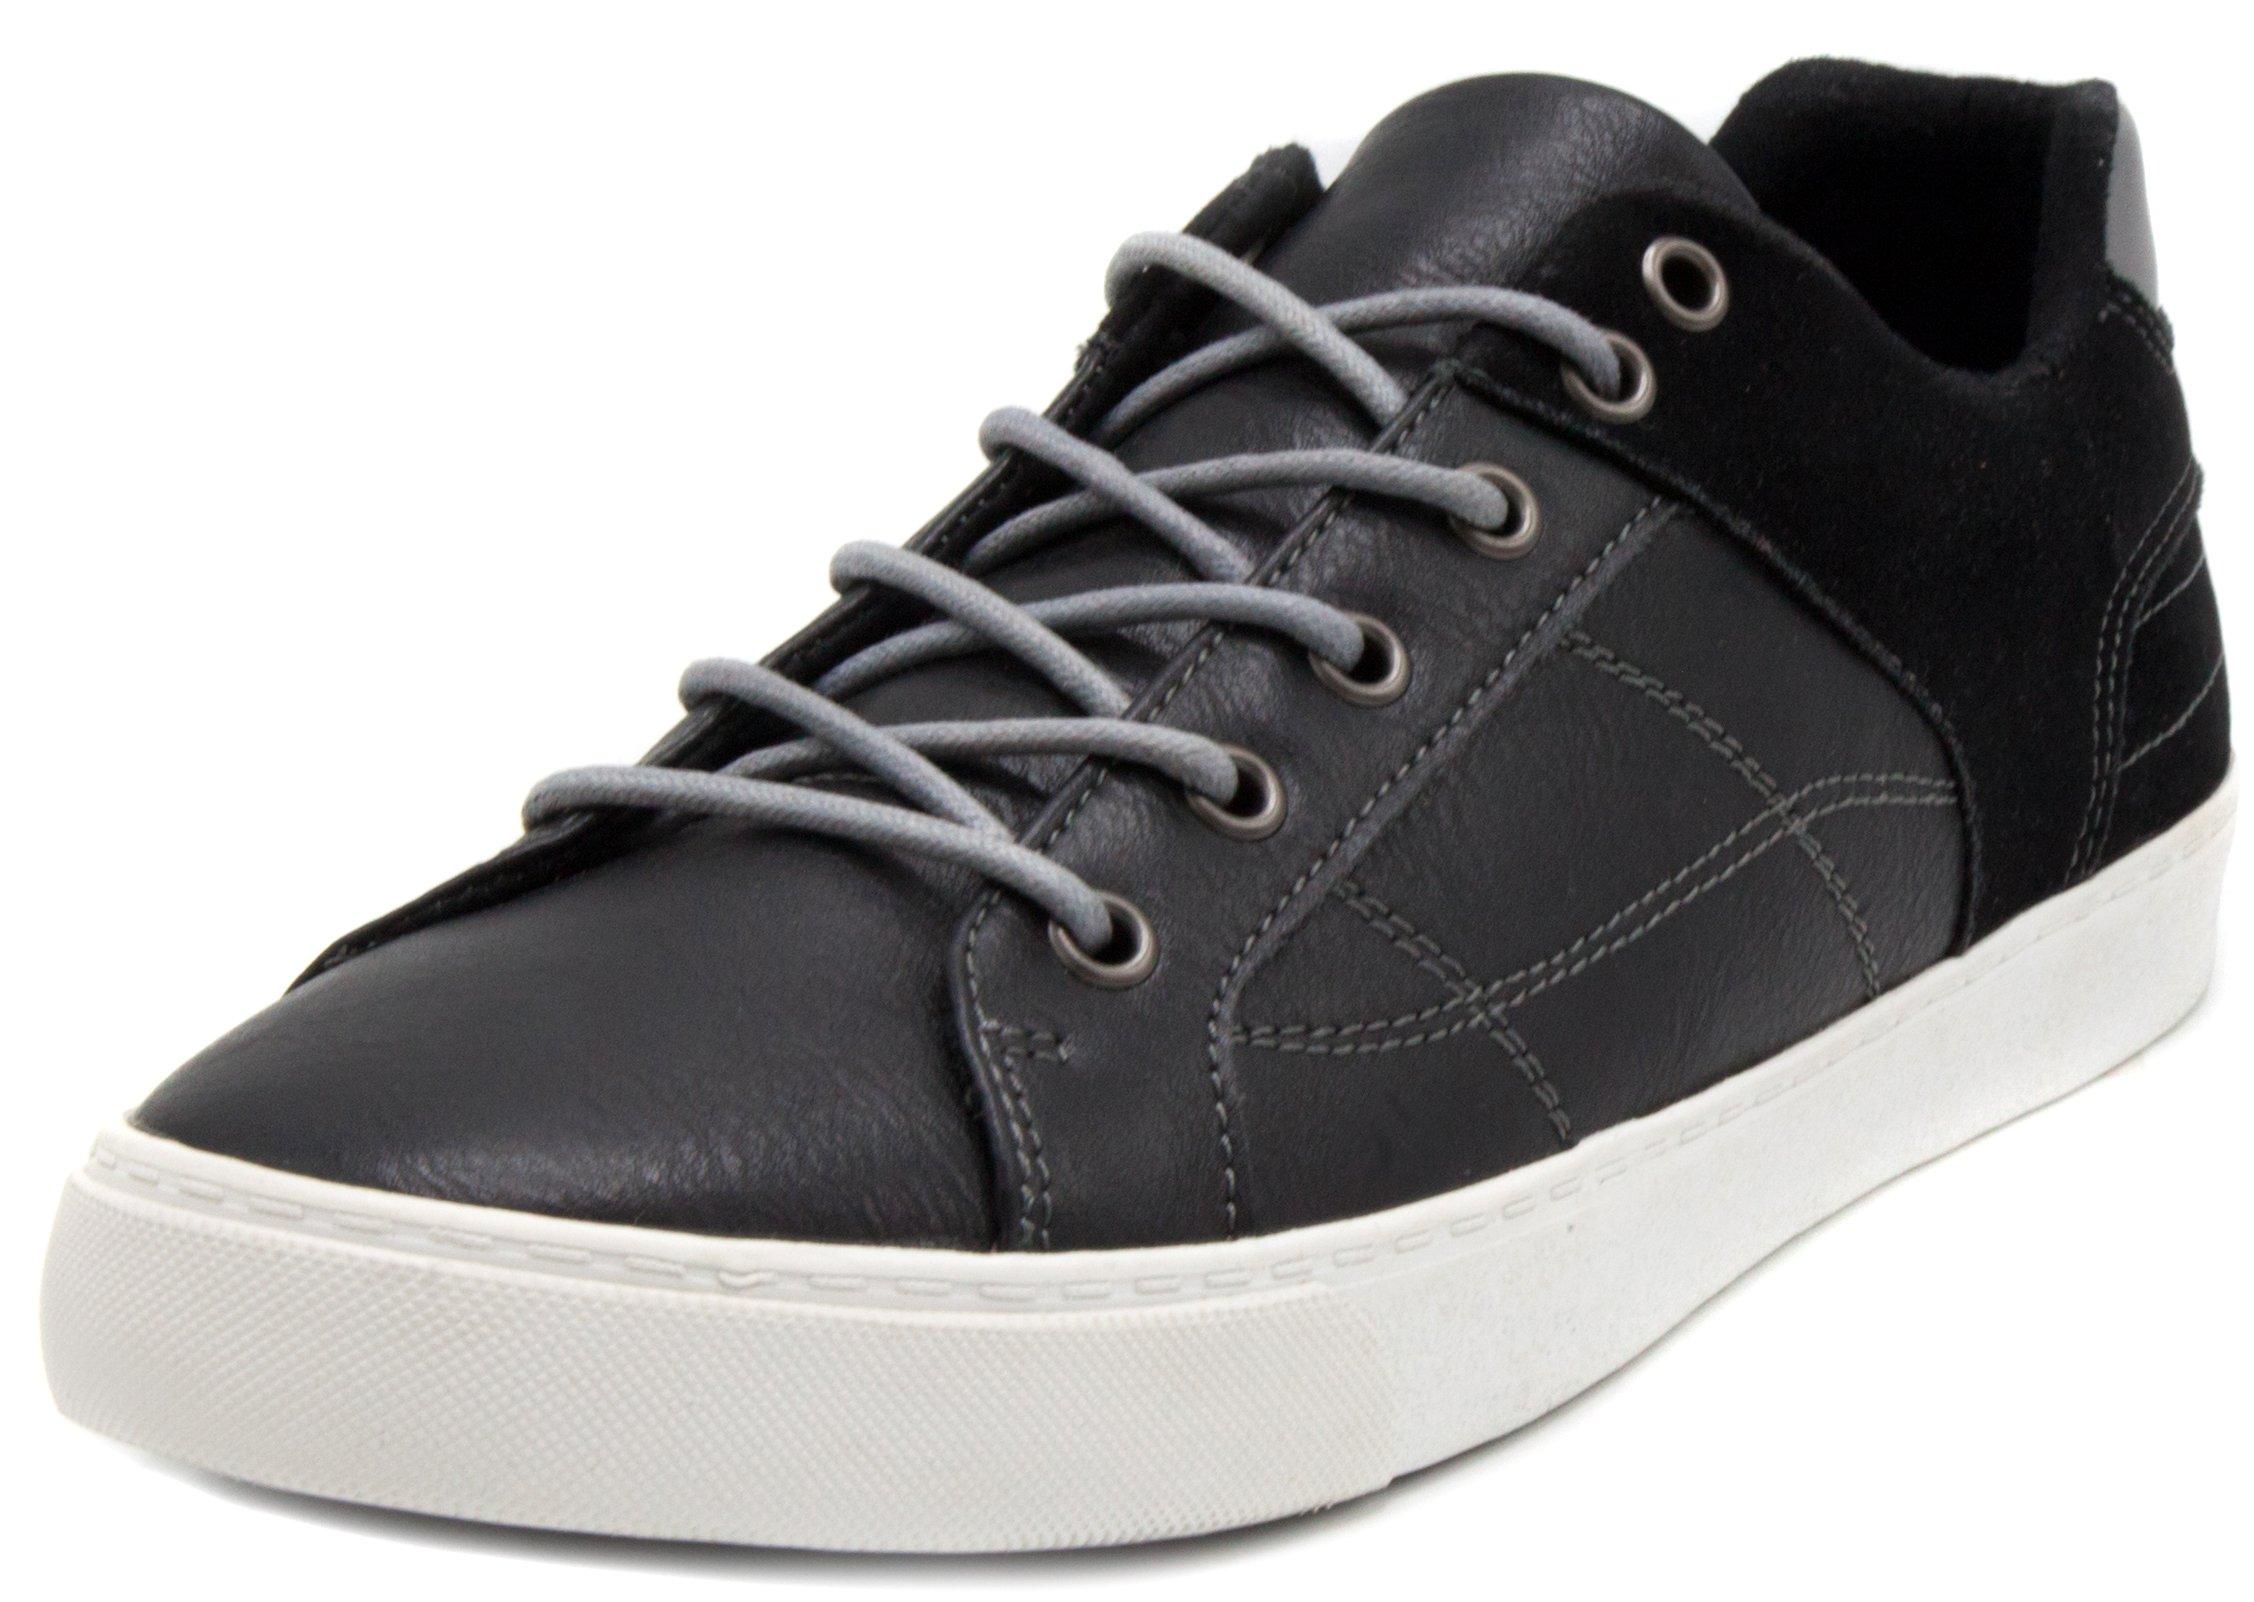 London Fog Mens Nottingham Fashion Sneaker Black 13